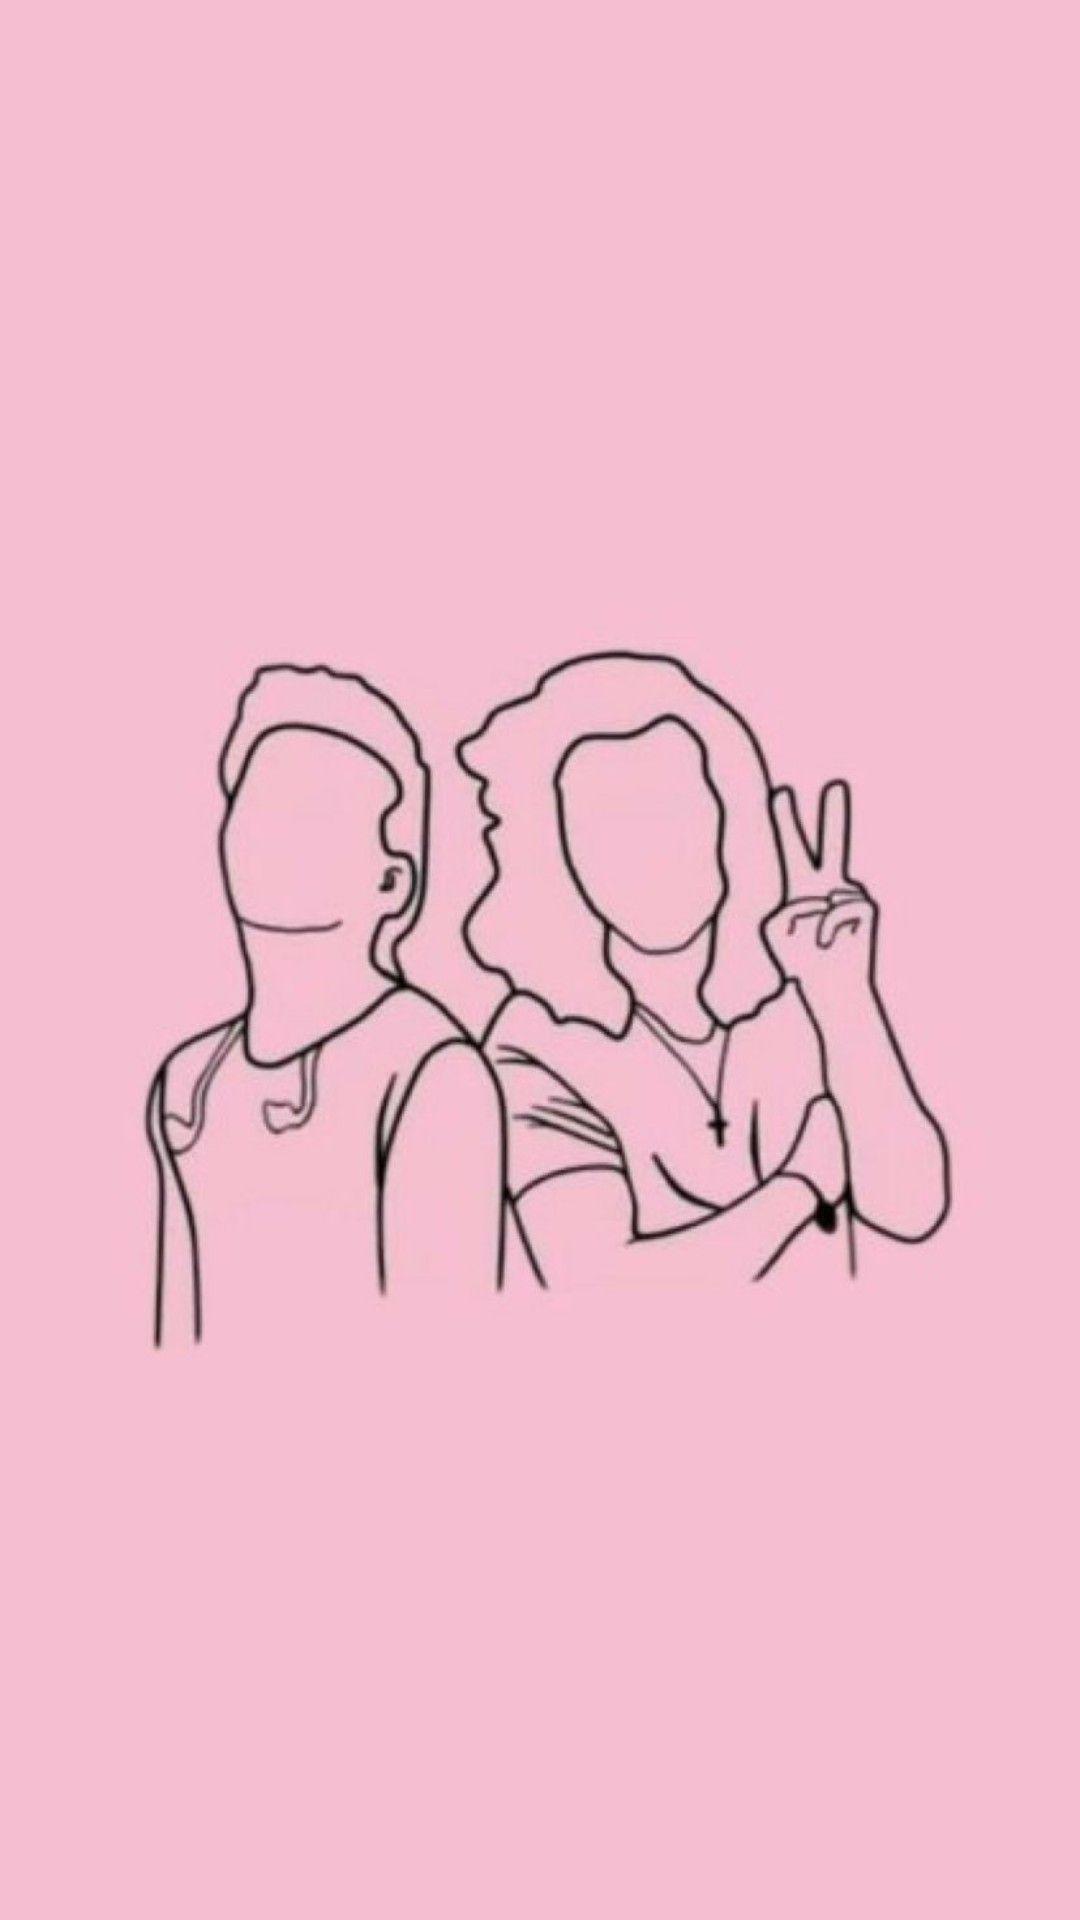 Larry Stylinson Dibujos De One Direction Dibujos Fáciles Carteles Gráficos